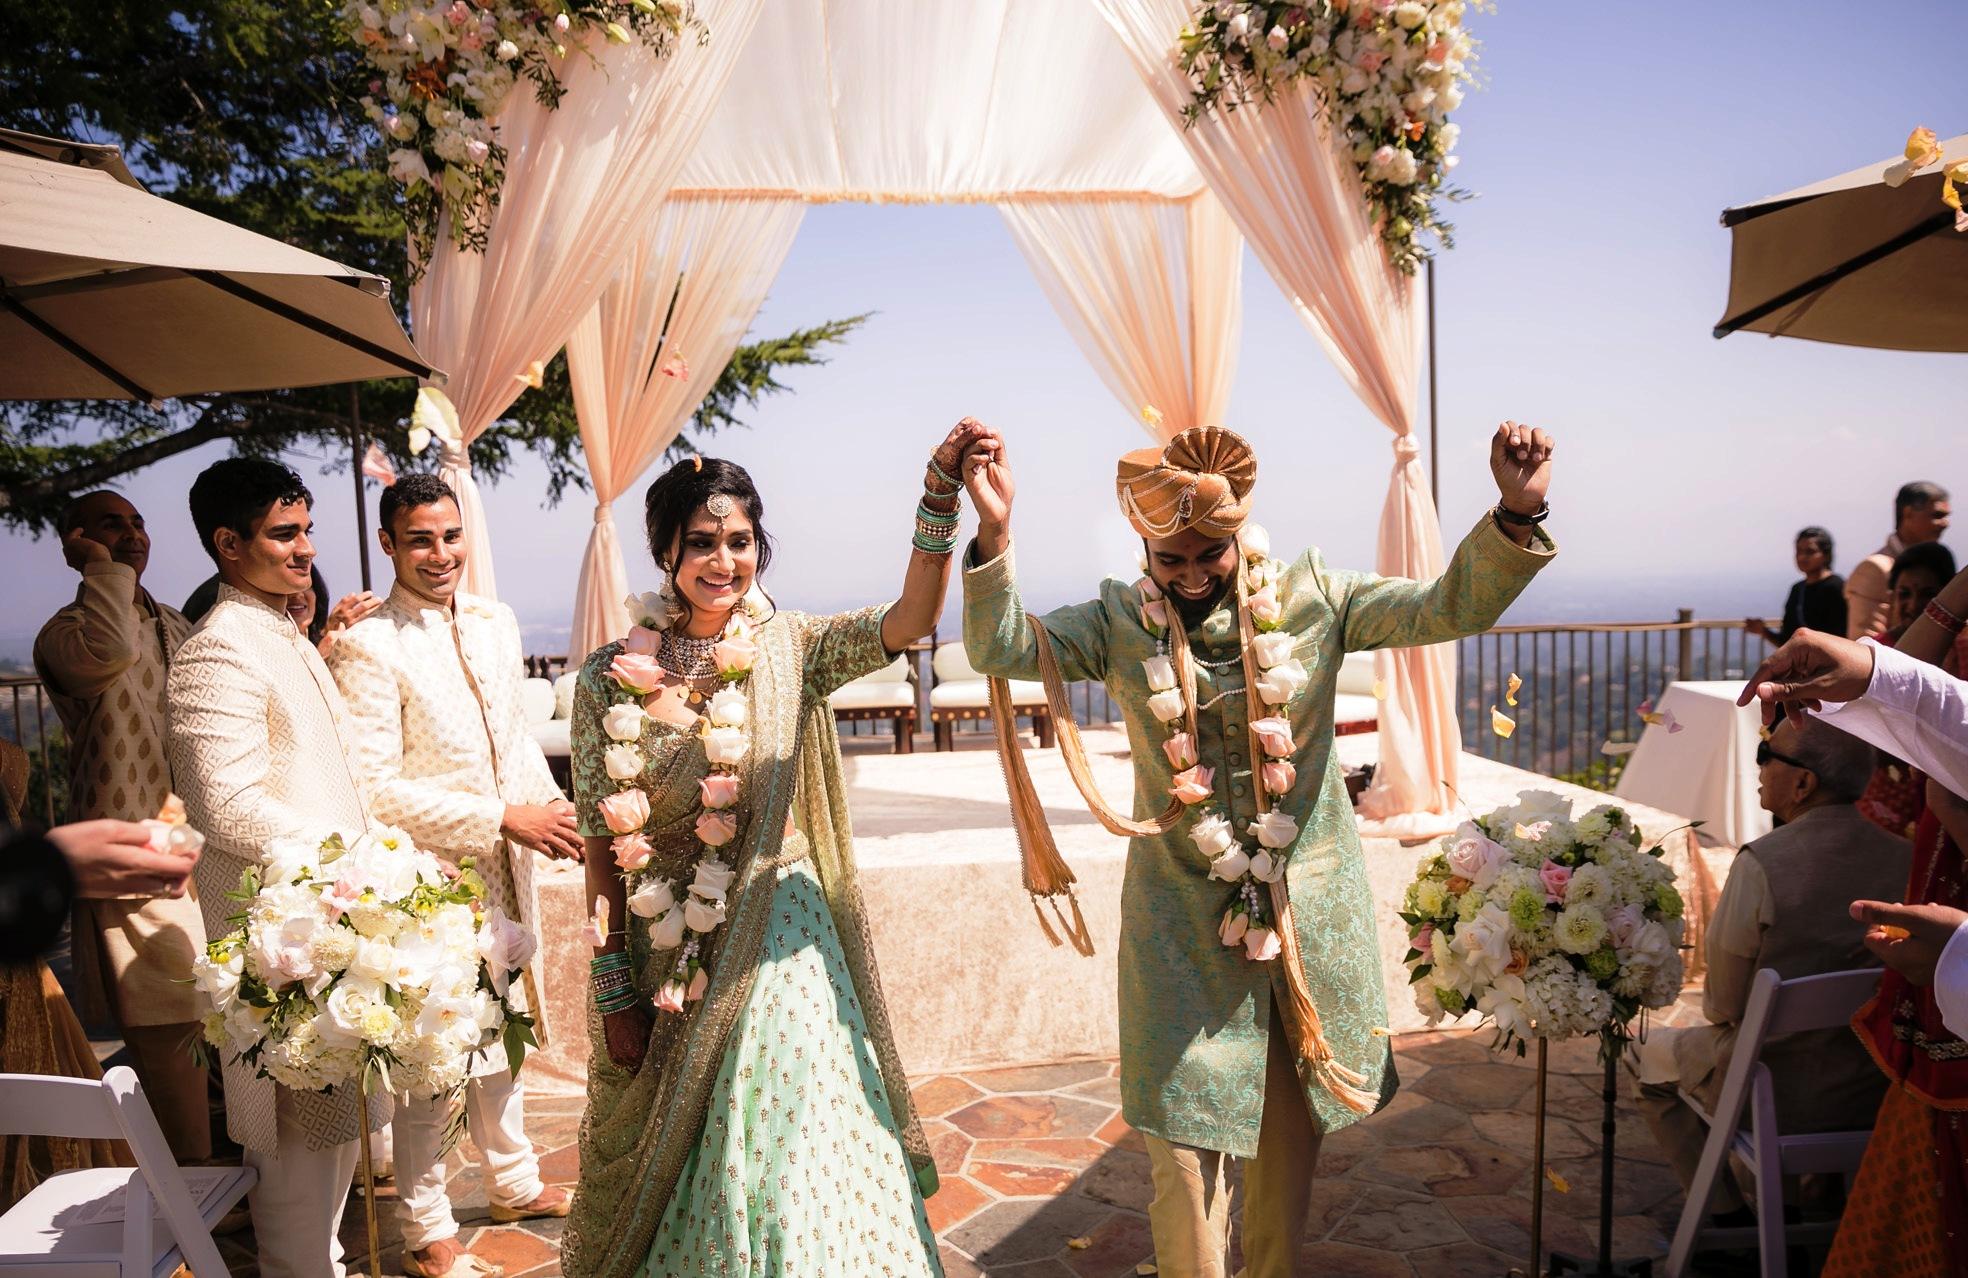 Top Summer Wedding Ideas Best Summer Wedding Themes 2020